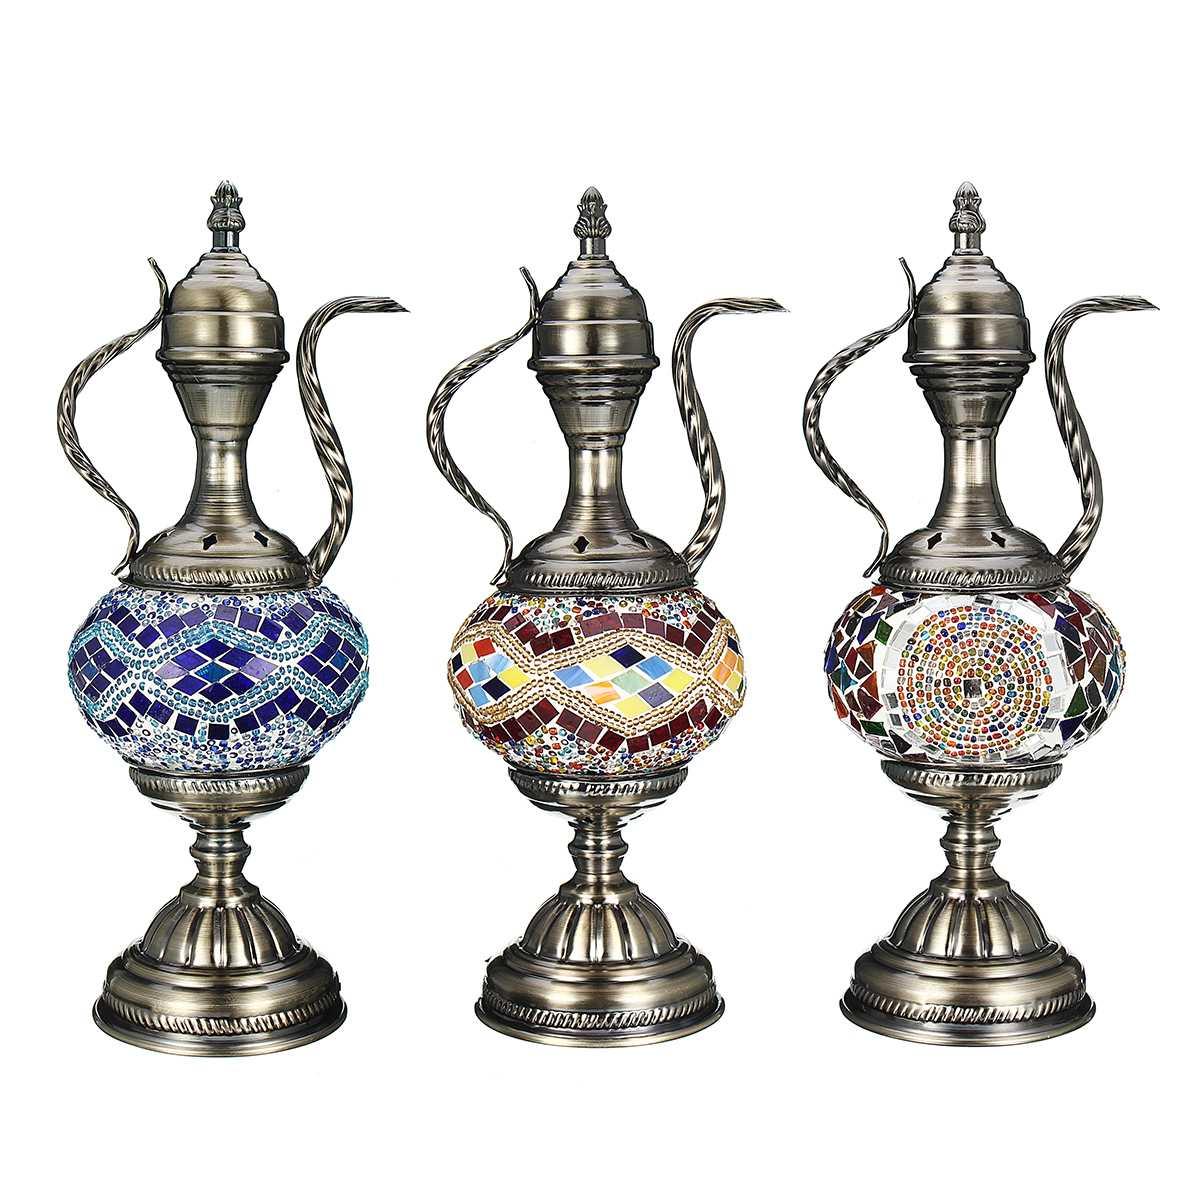 Retro Romantic Table Lamp Decorative Light Turkish Lamp Glass Colorful Handmade for Home Bedroom Bar Coffee Shop Art Decor Gift